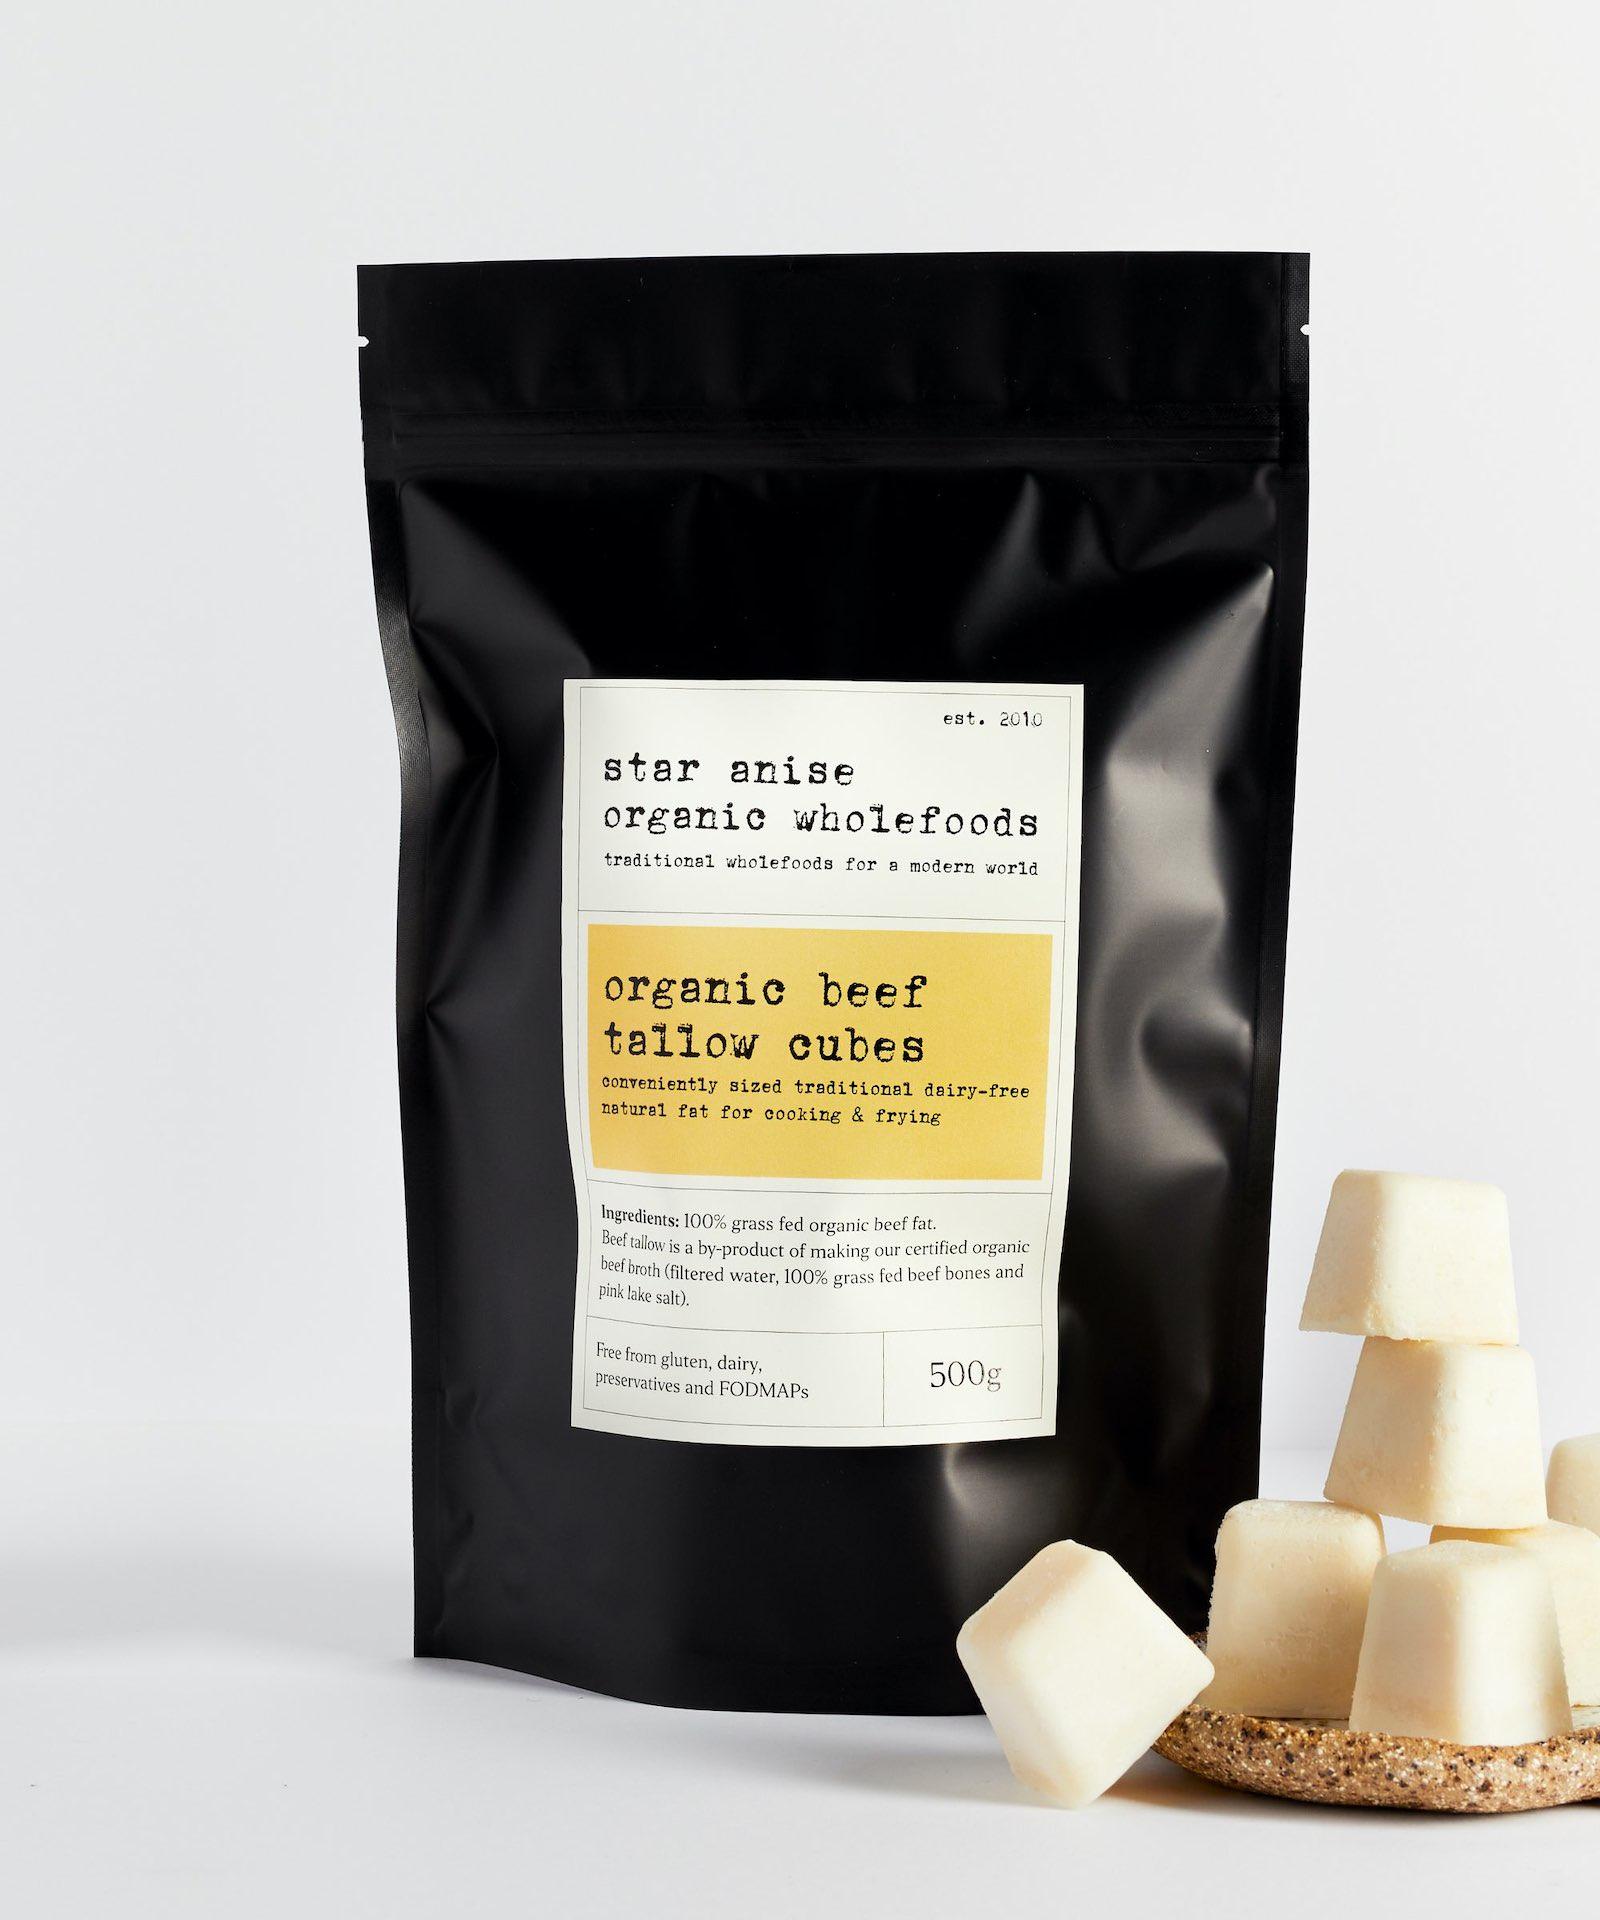 Star Anise Organics packaging design